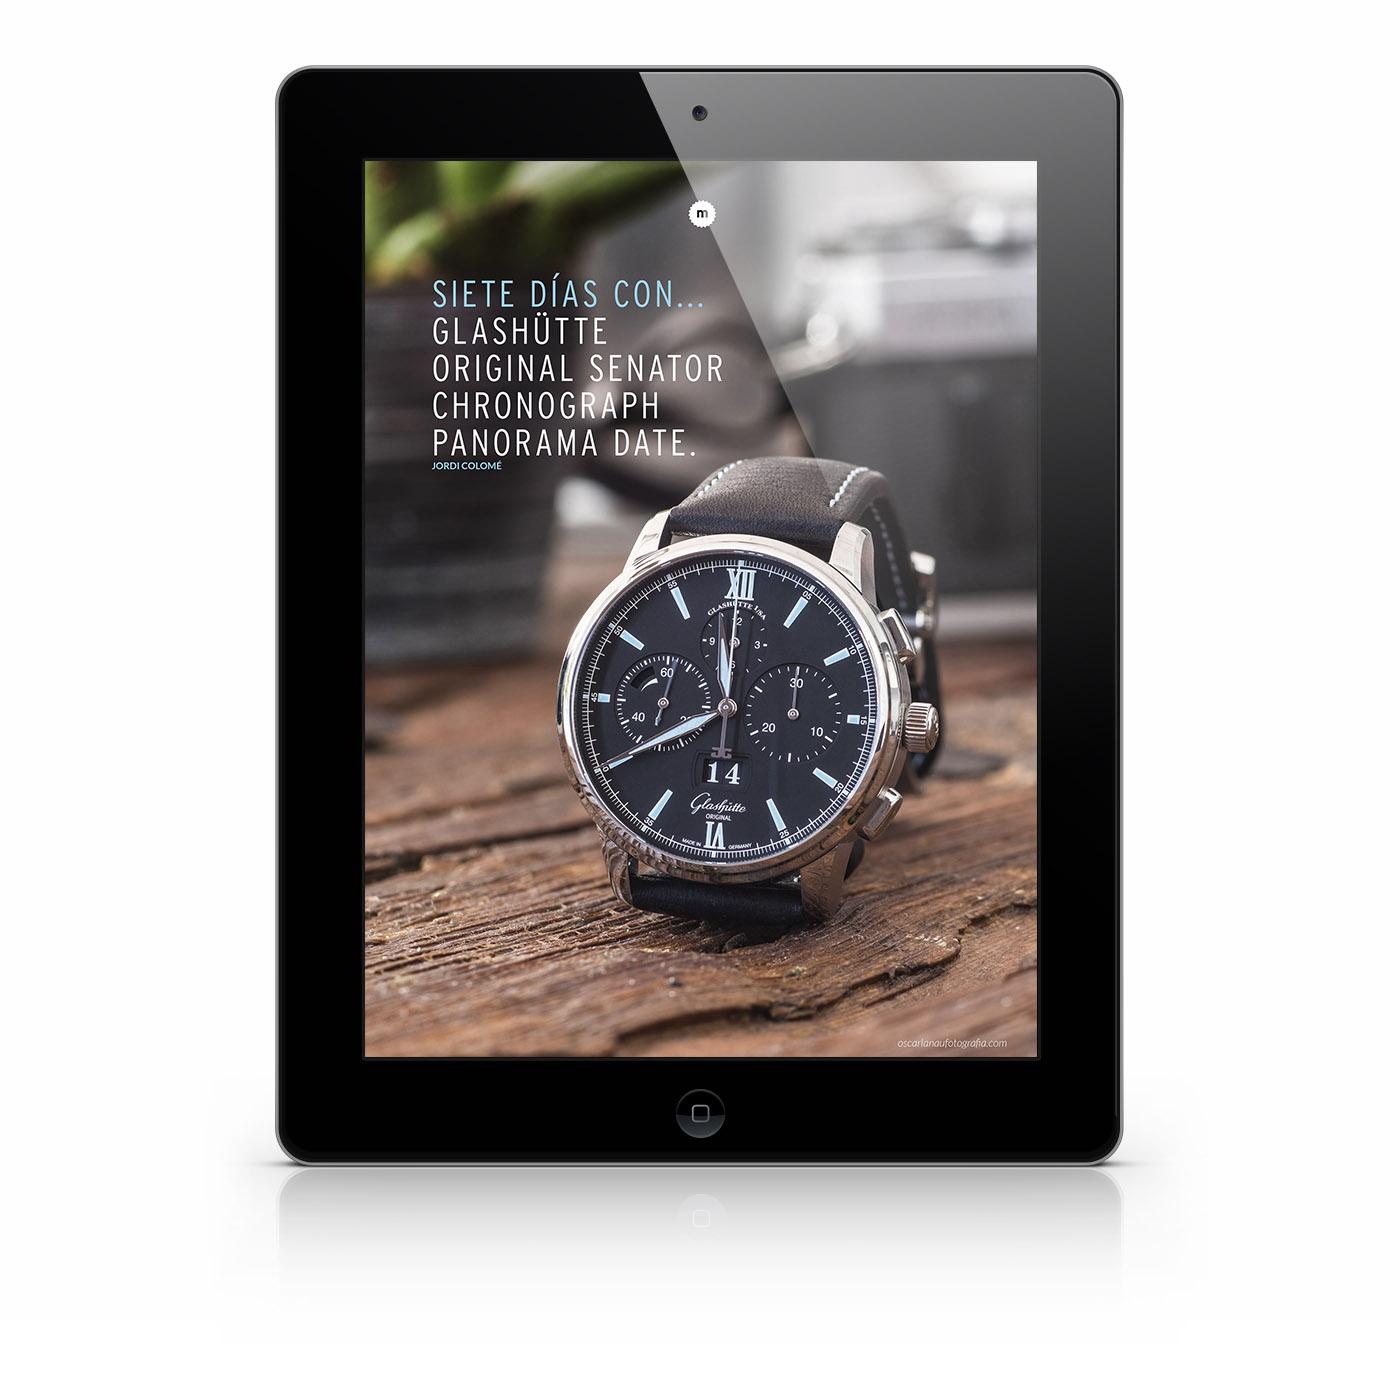 reloj-ipad-revista-creartiva